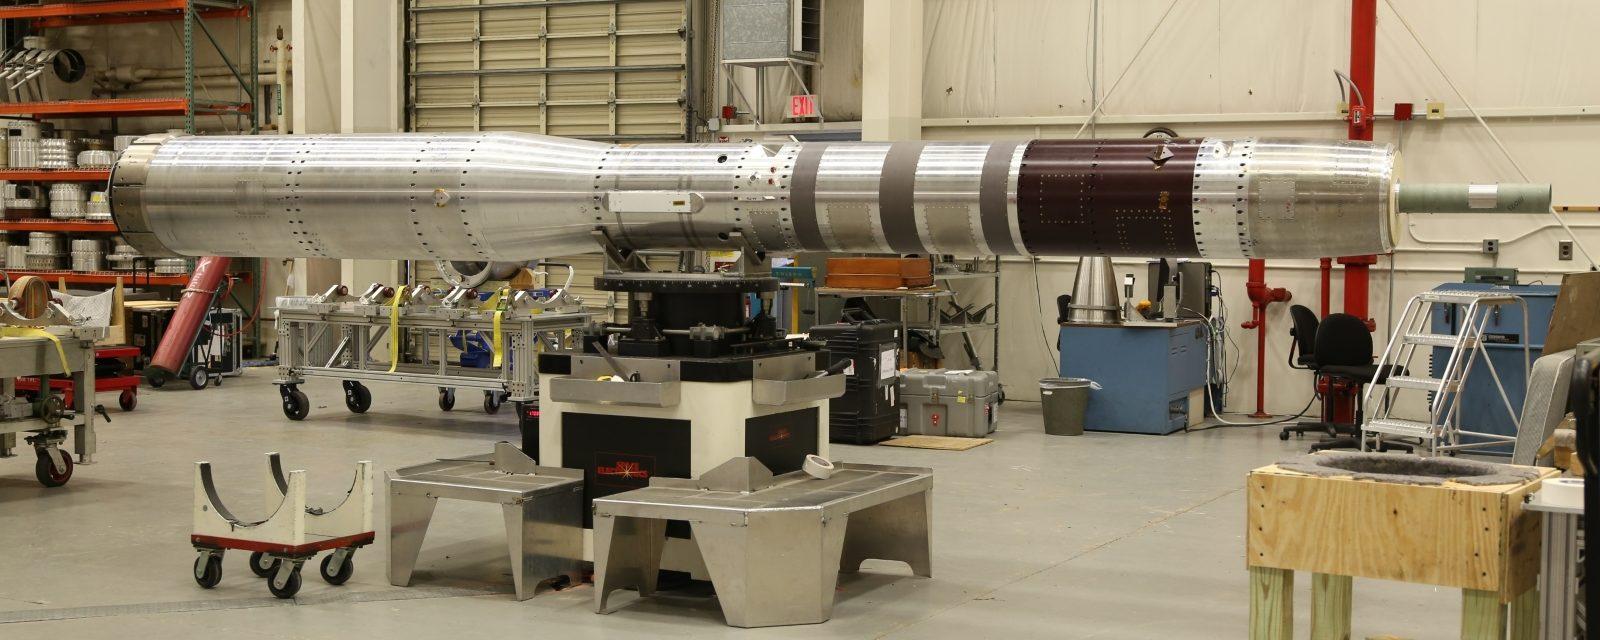 Nanotube technology test: Black Brant IX rocket (SubTec-7 mission)